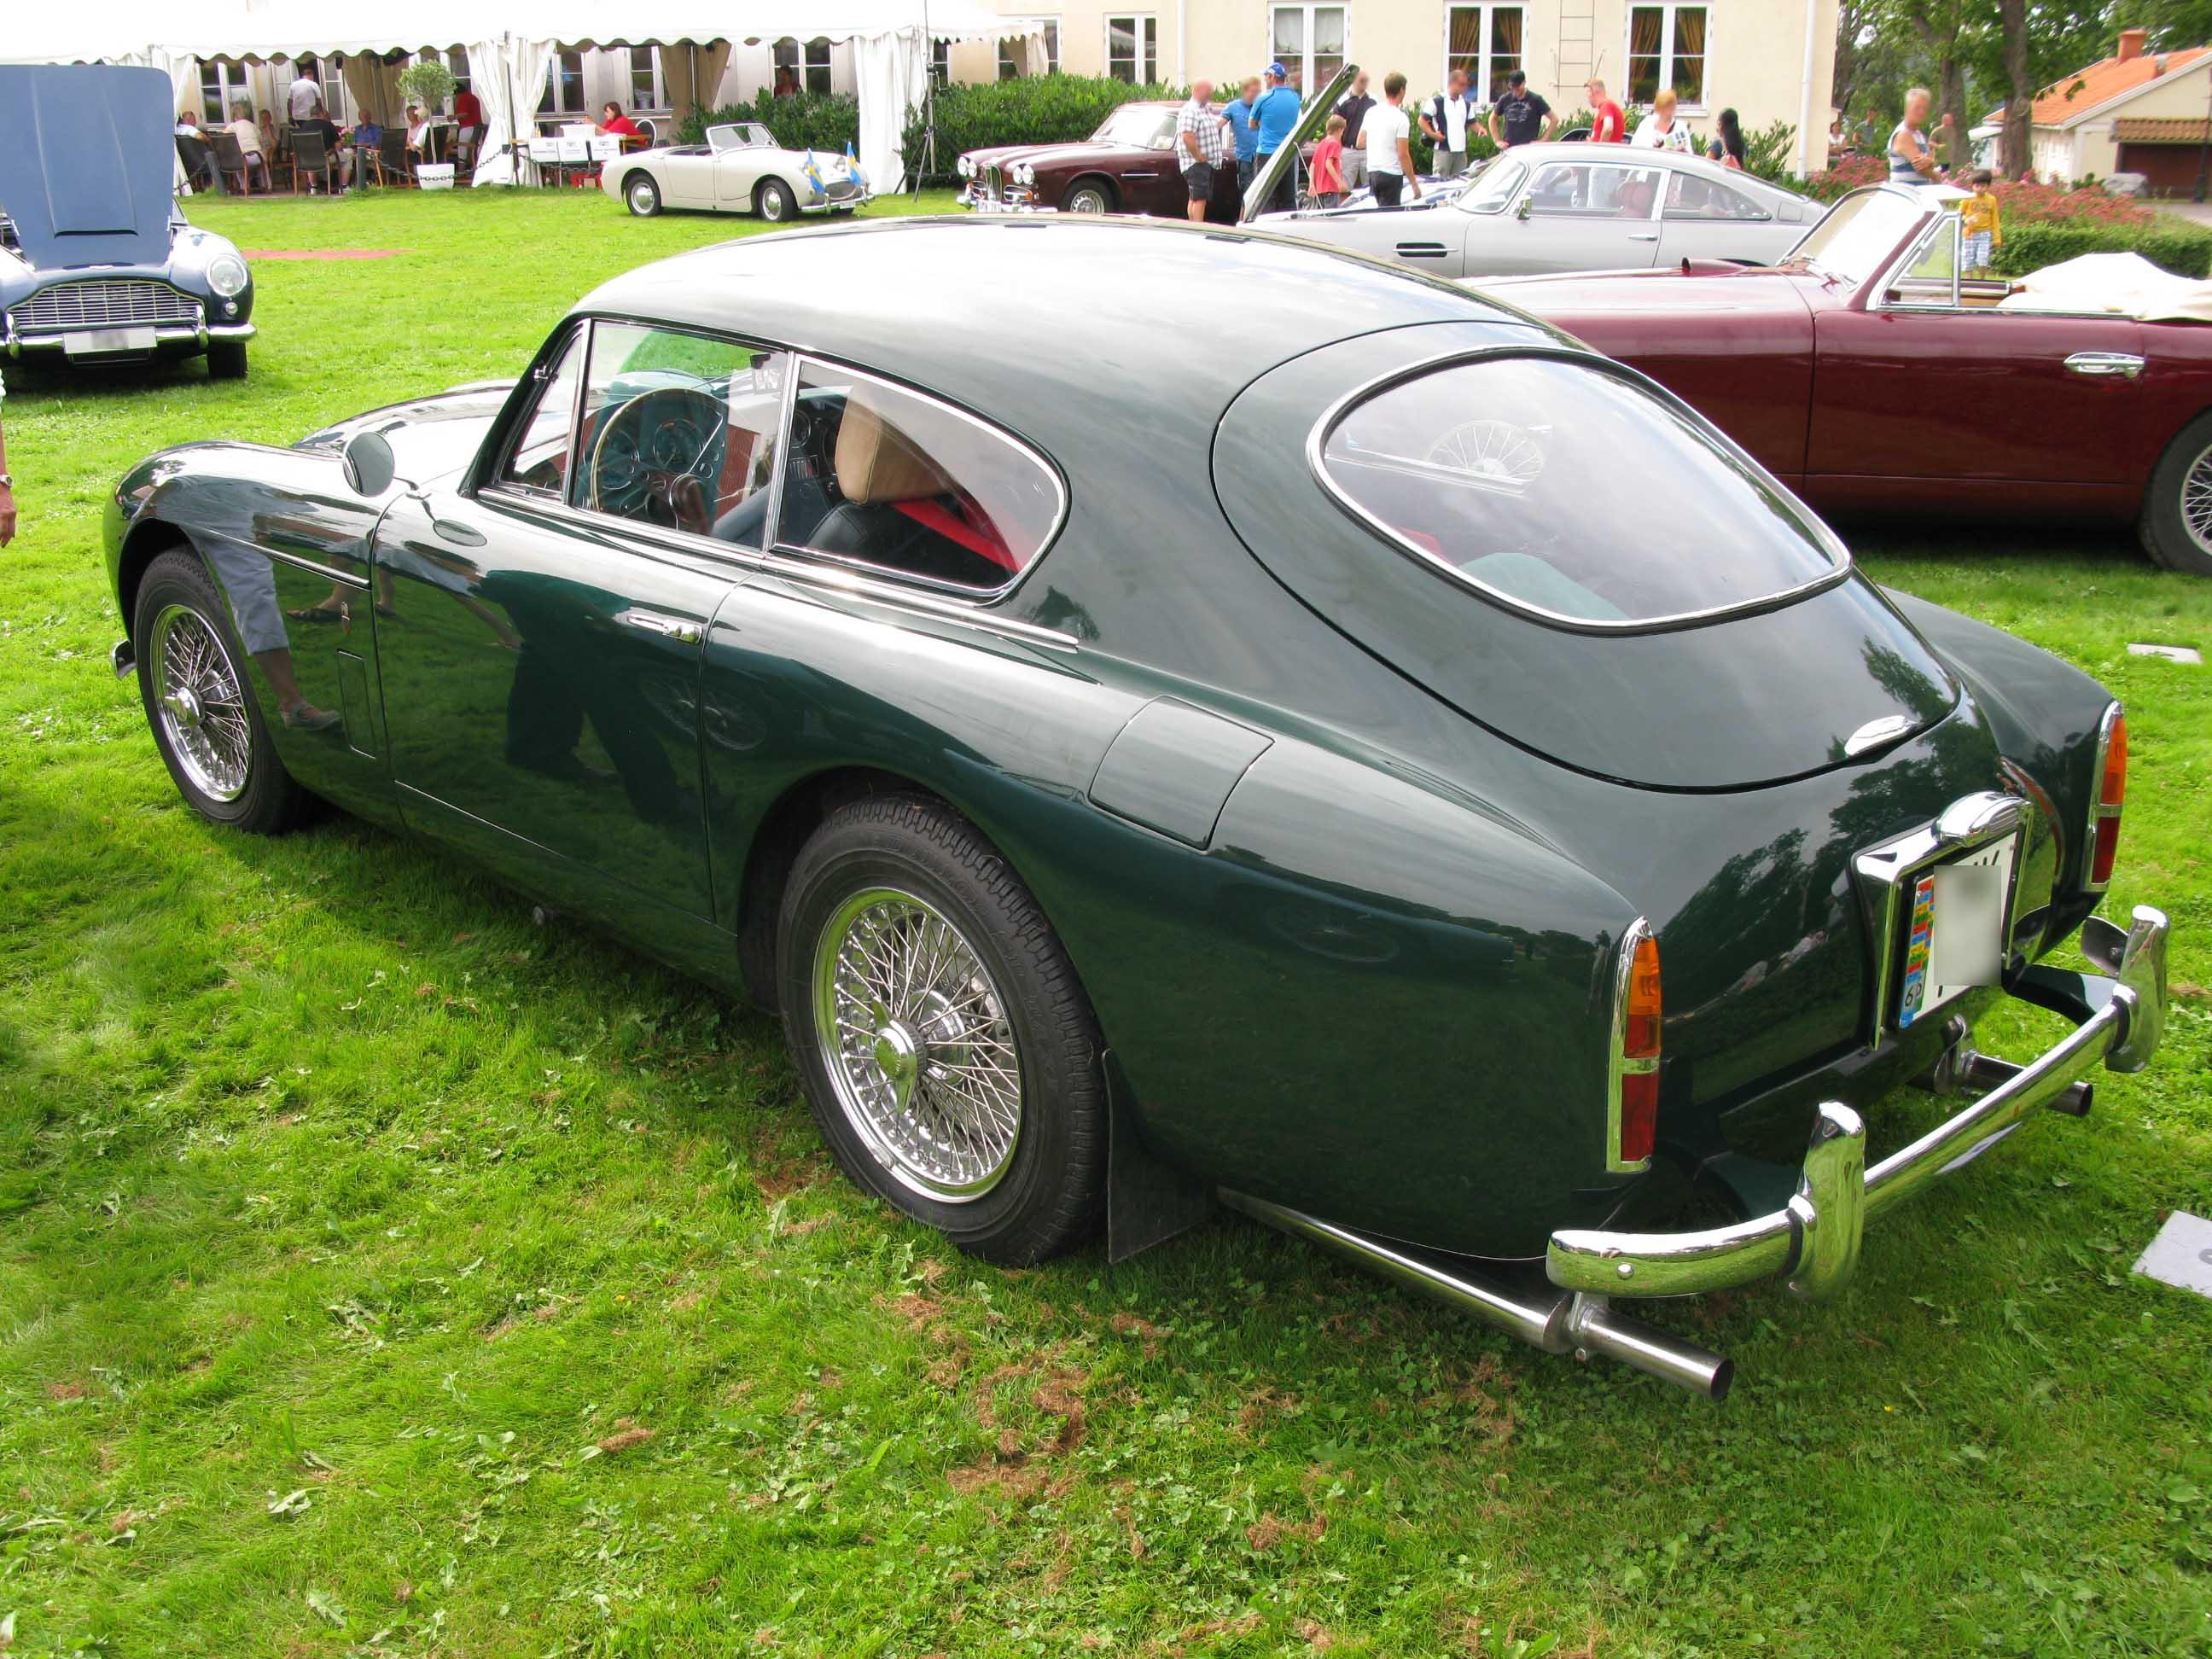 File Aston Martin DB Mk III Rljpg Wikimedia Commons - 1957 aston martin